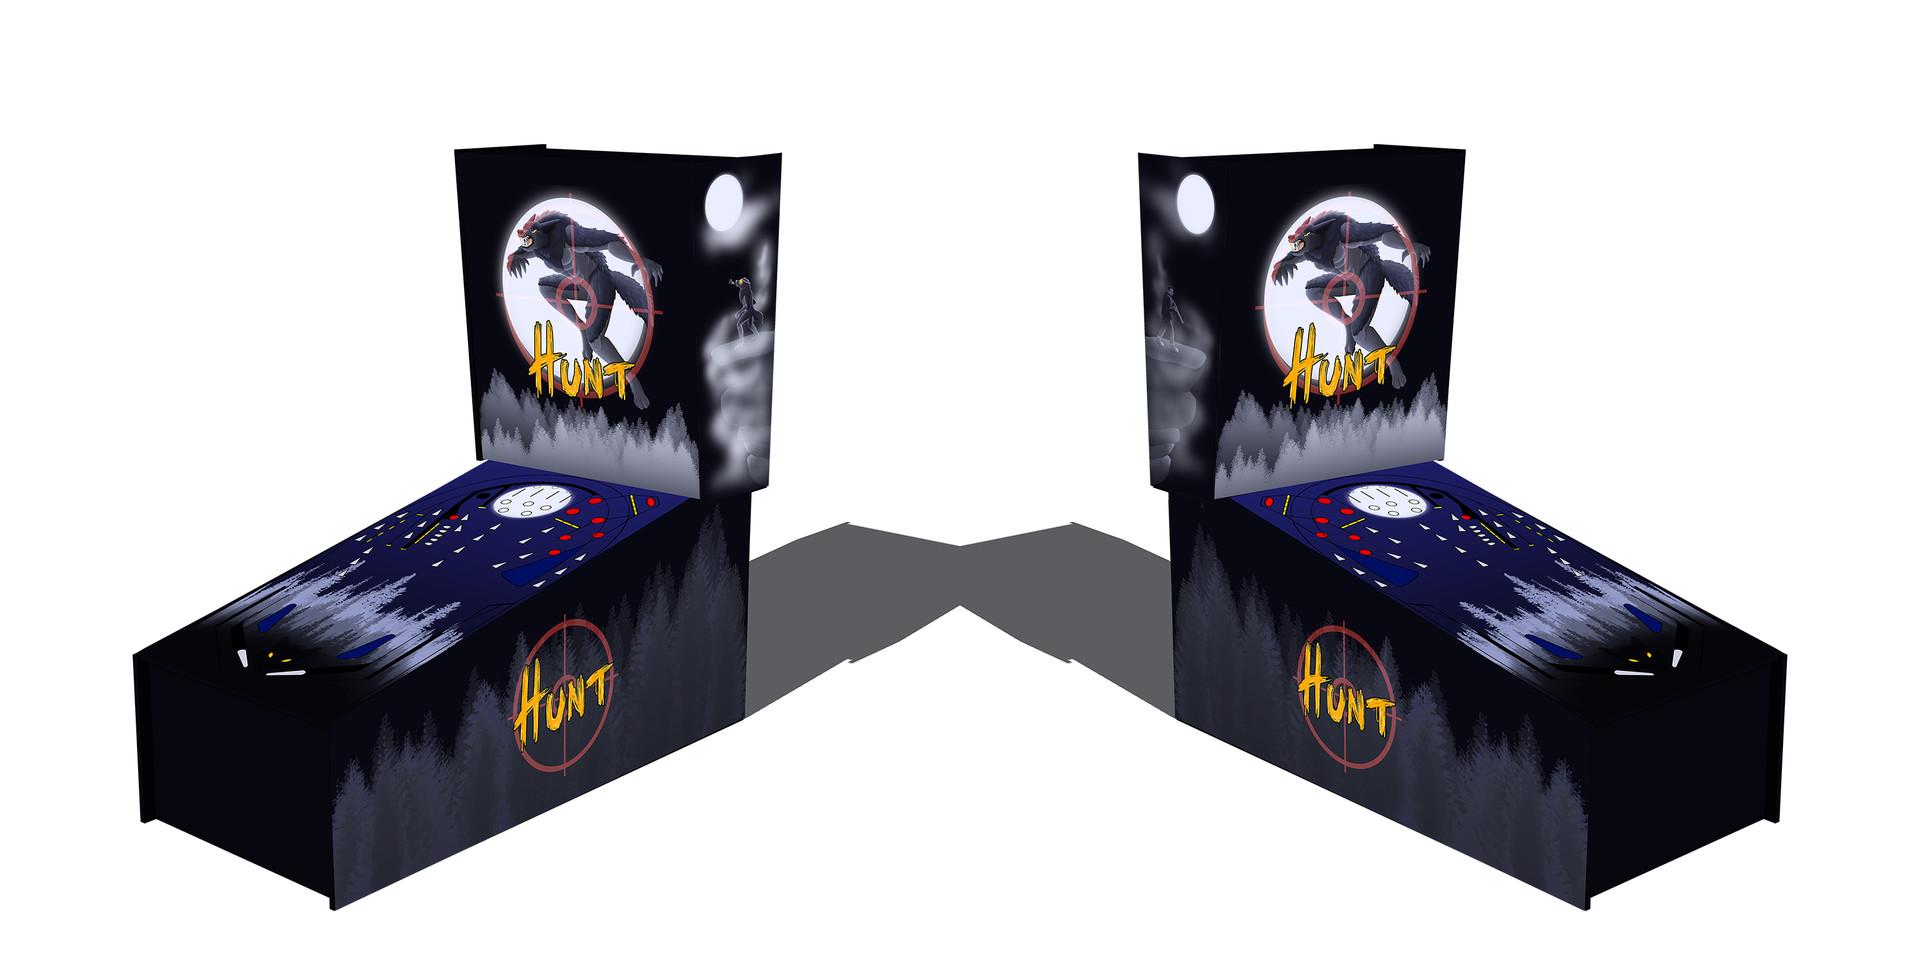 ArtStation - HUNT - Werewolf-themed Pinball Machine assets